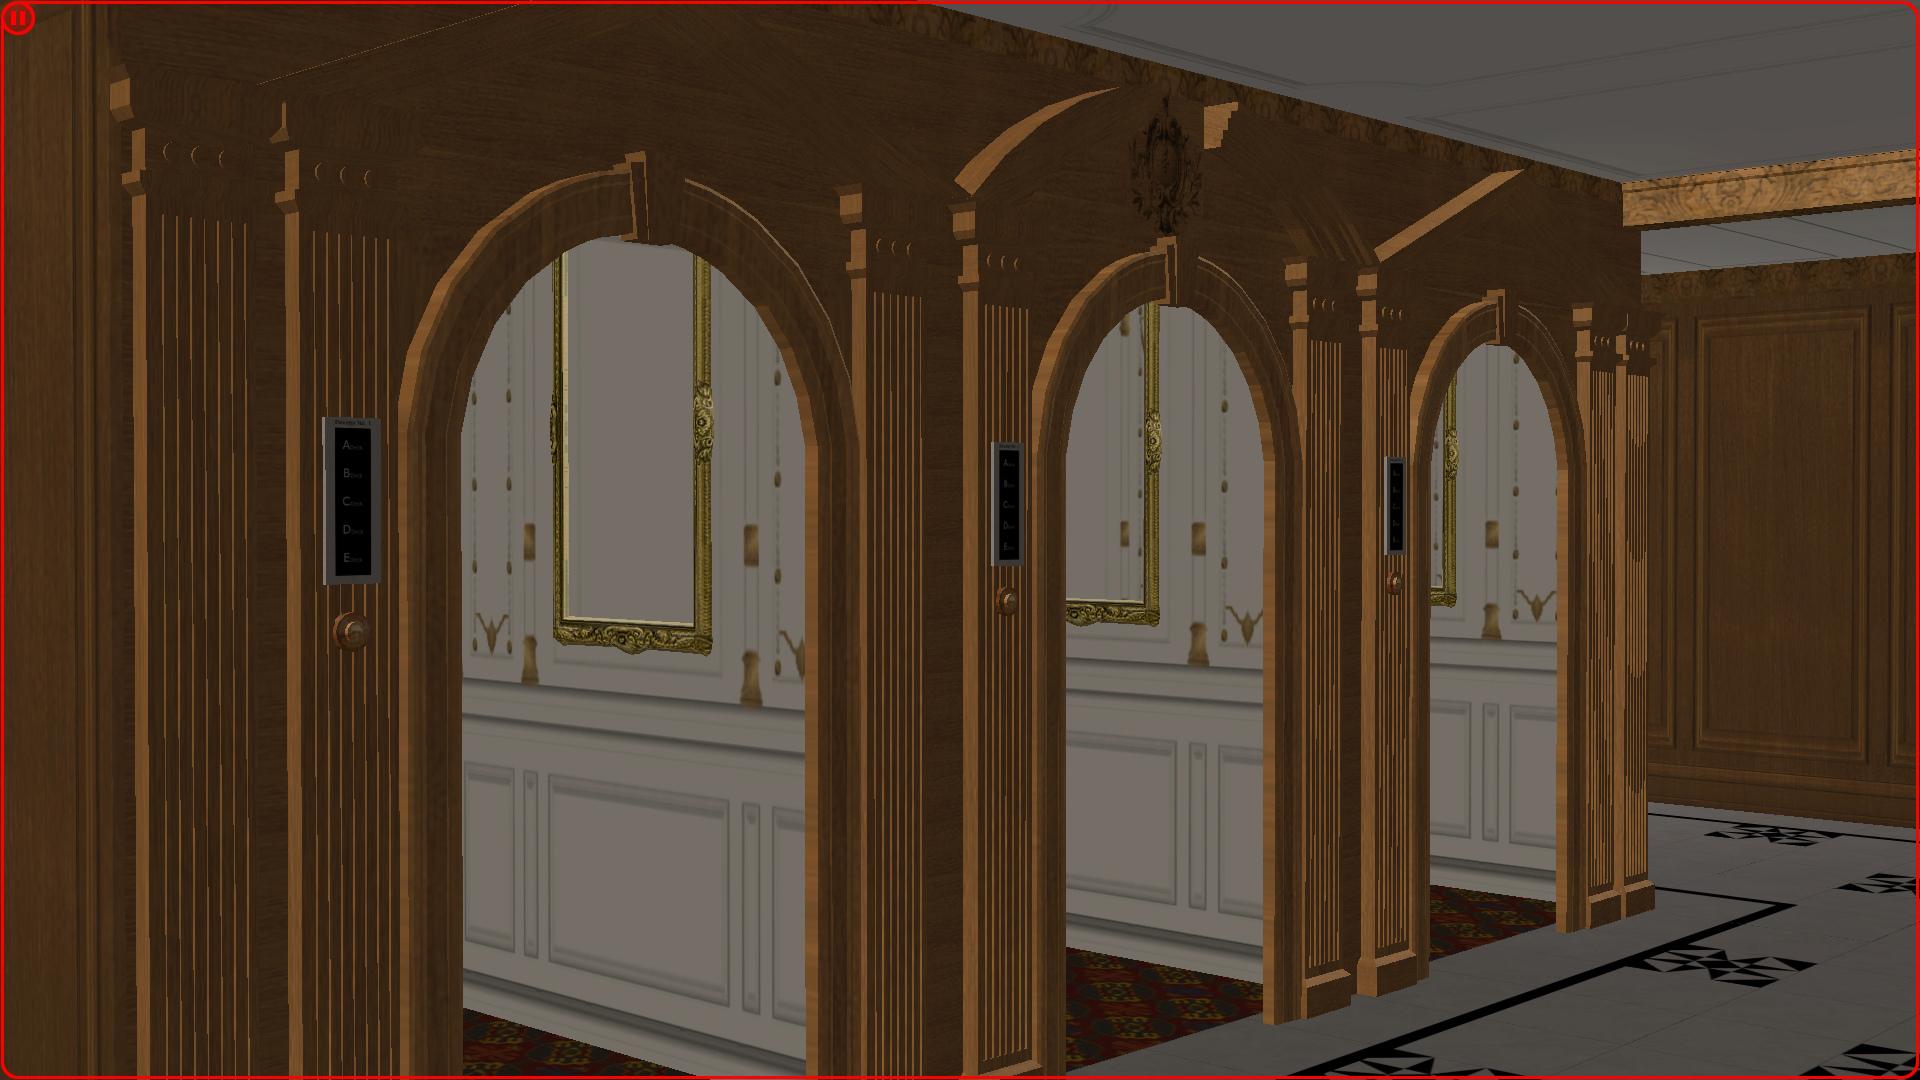 The Sims 2 Titanic Sims2e65